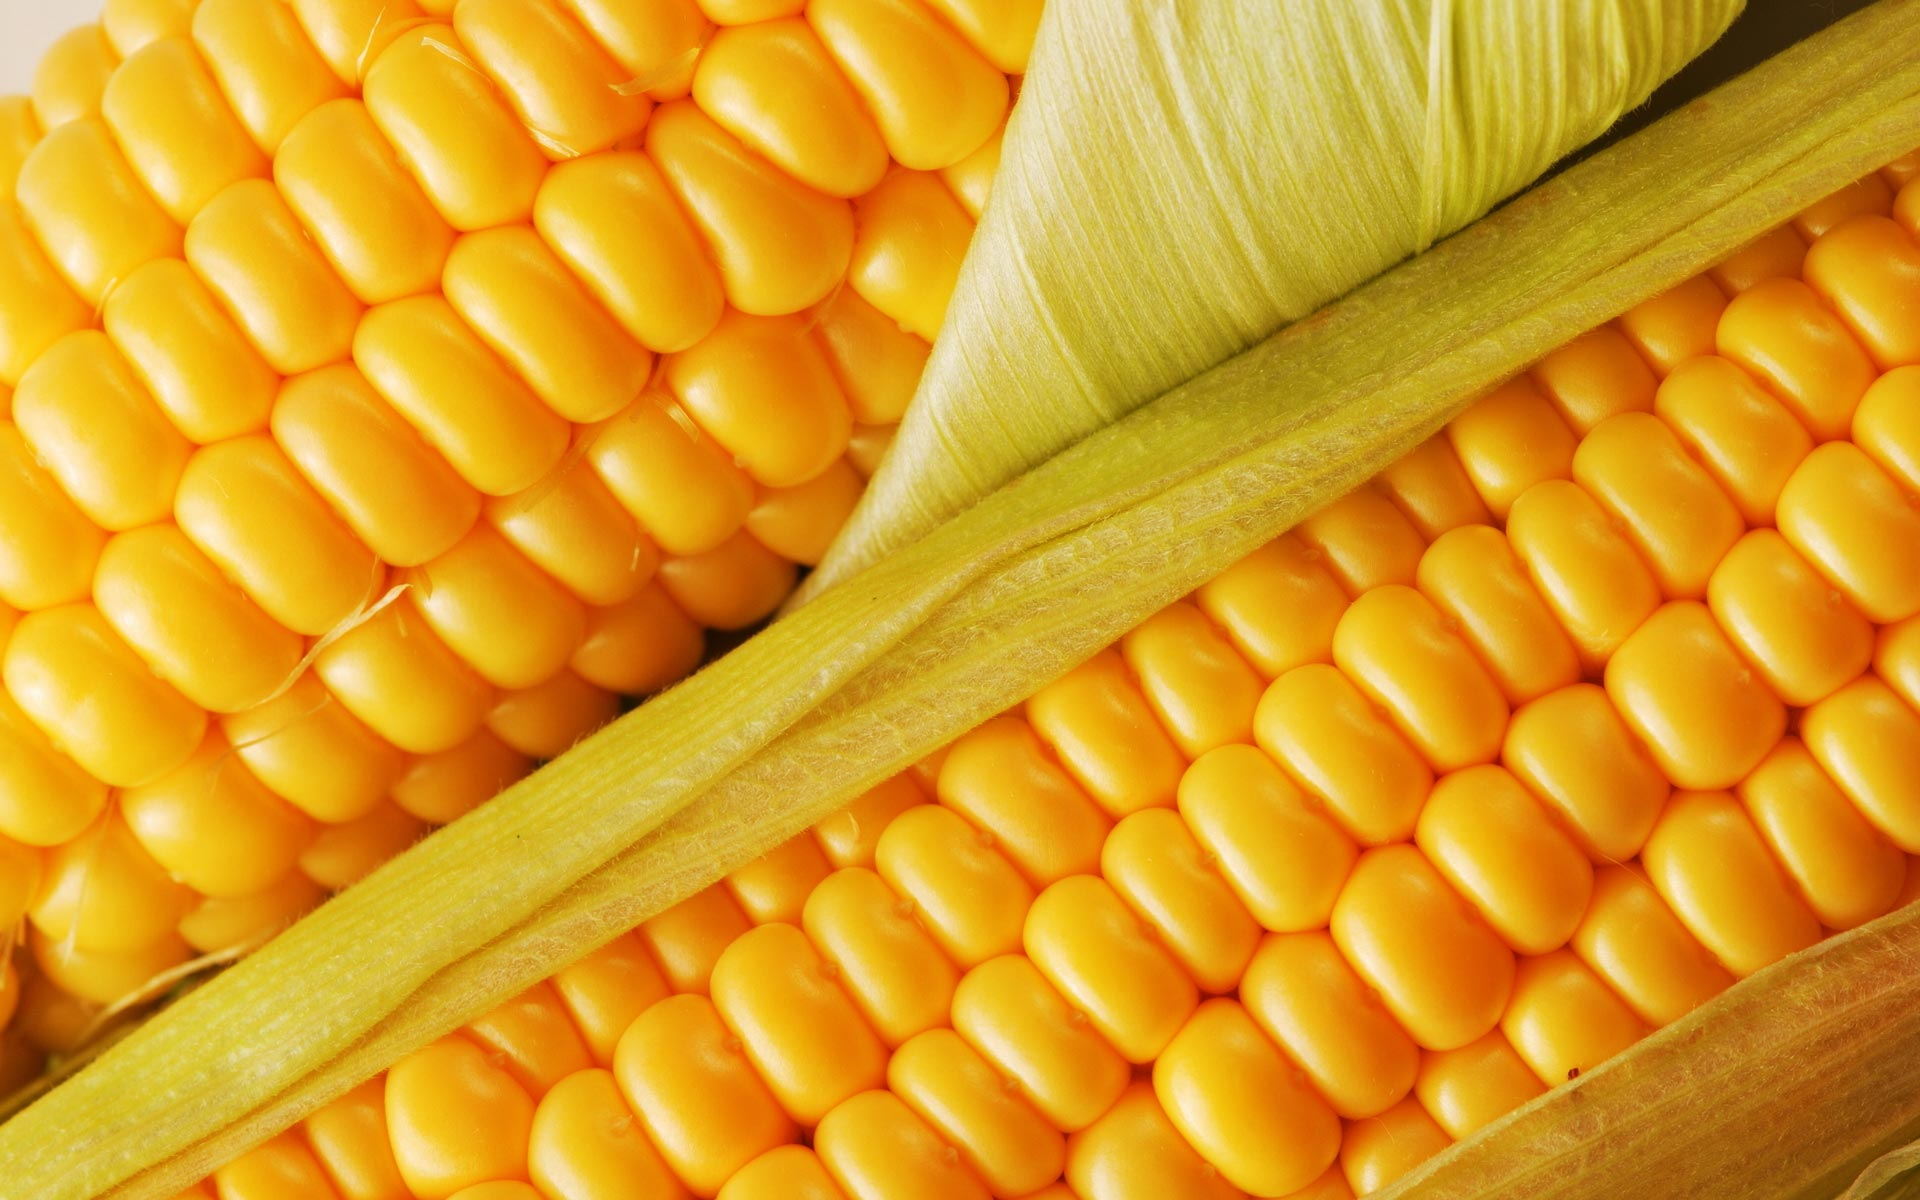 chanceller-comercio-exterior-agro-agribusiness-milho-corn